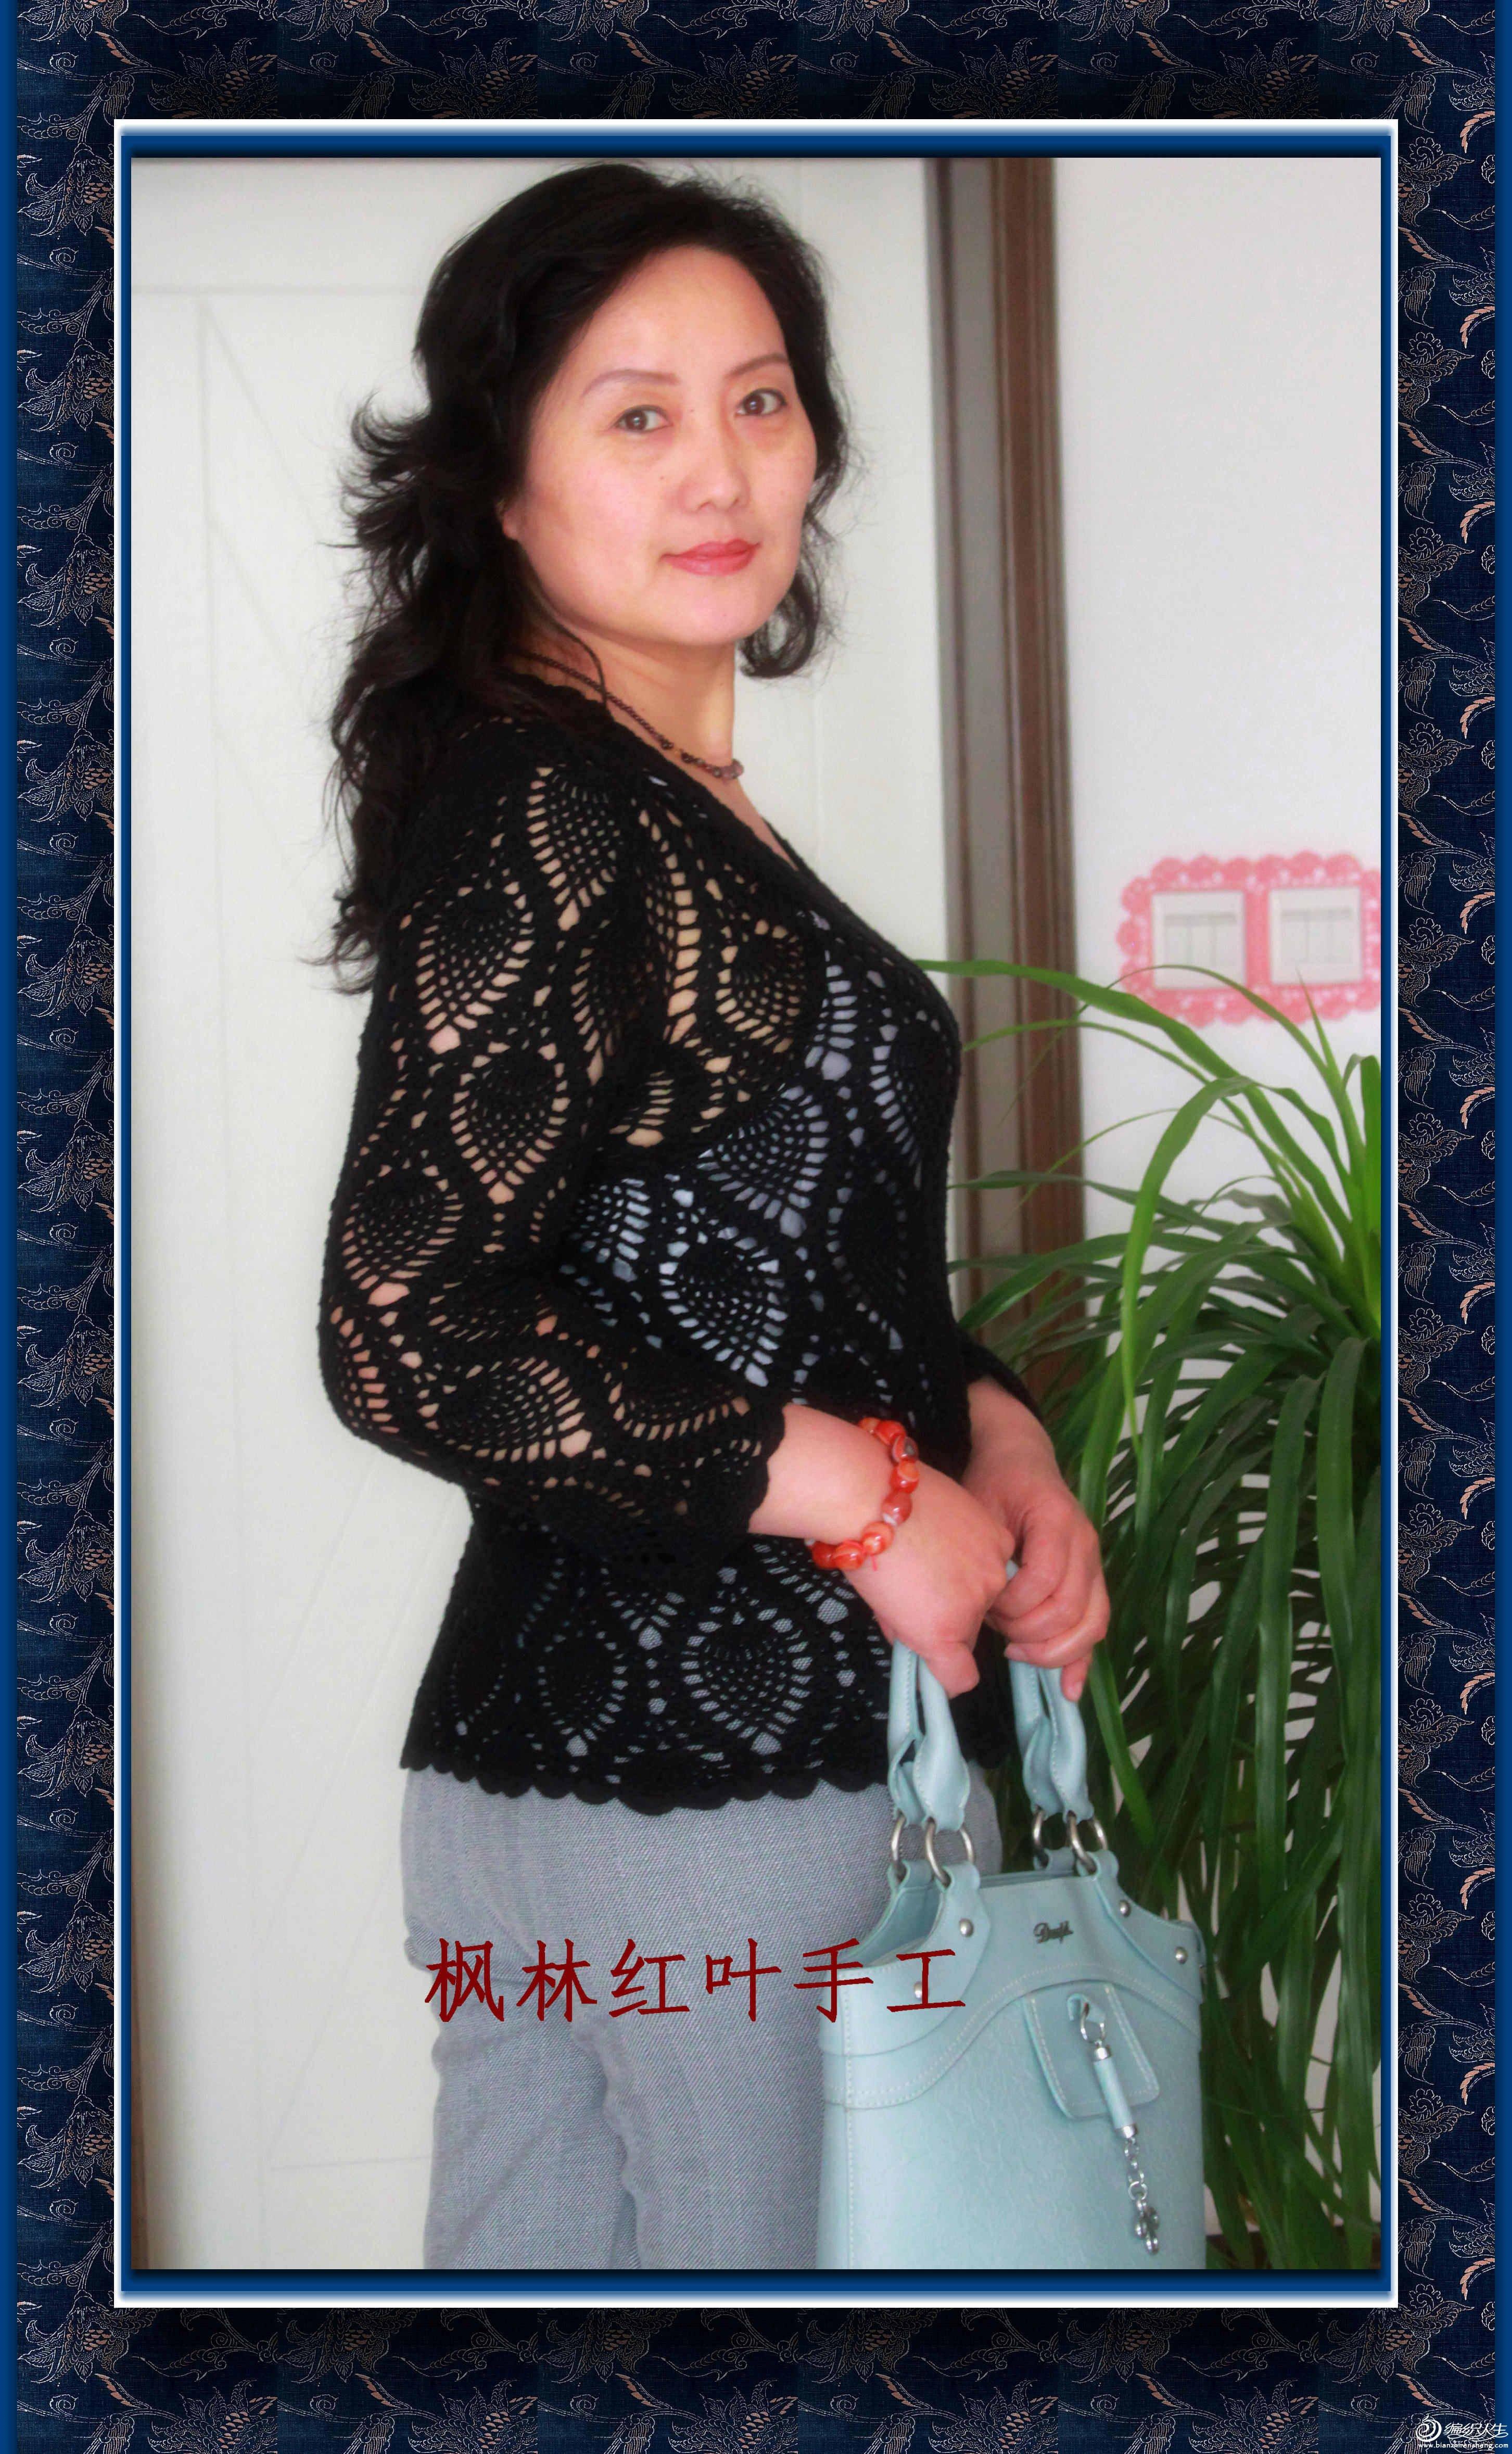 IMG_5688.jpg